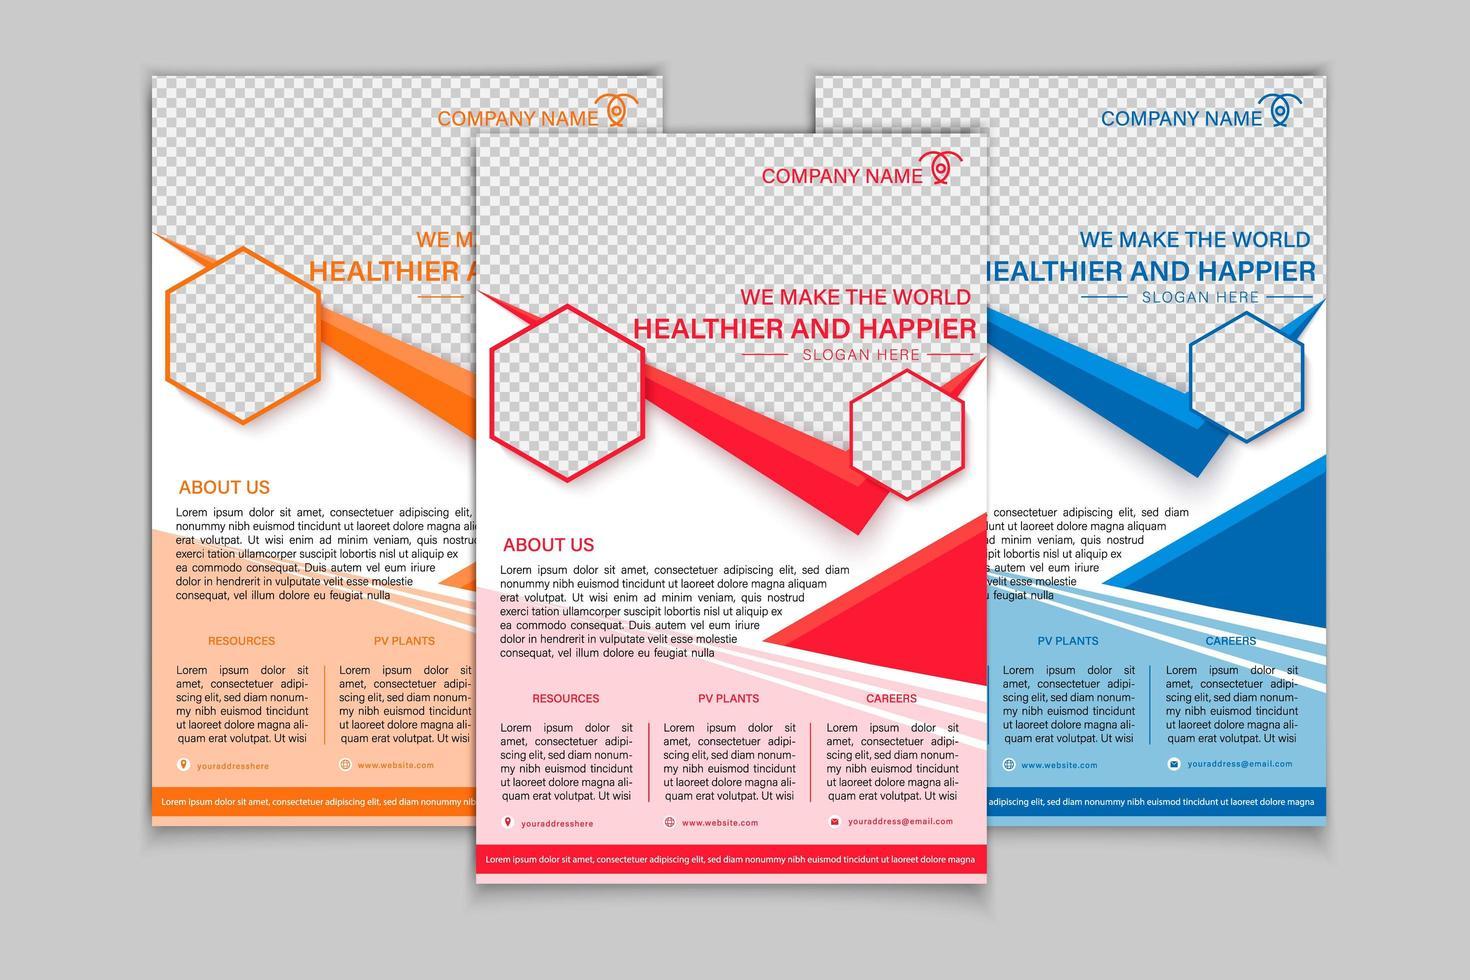 flygblad rapporterar infographic vektor